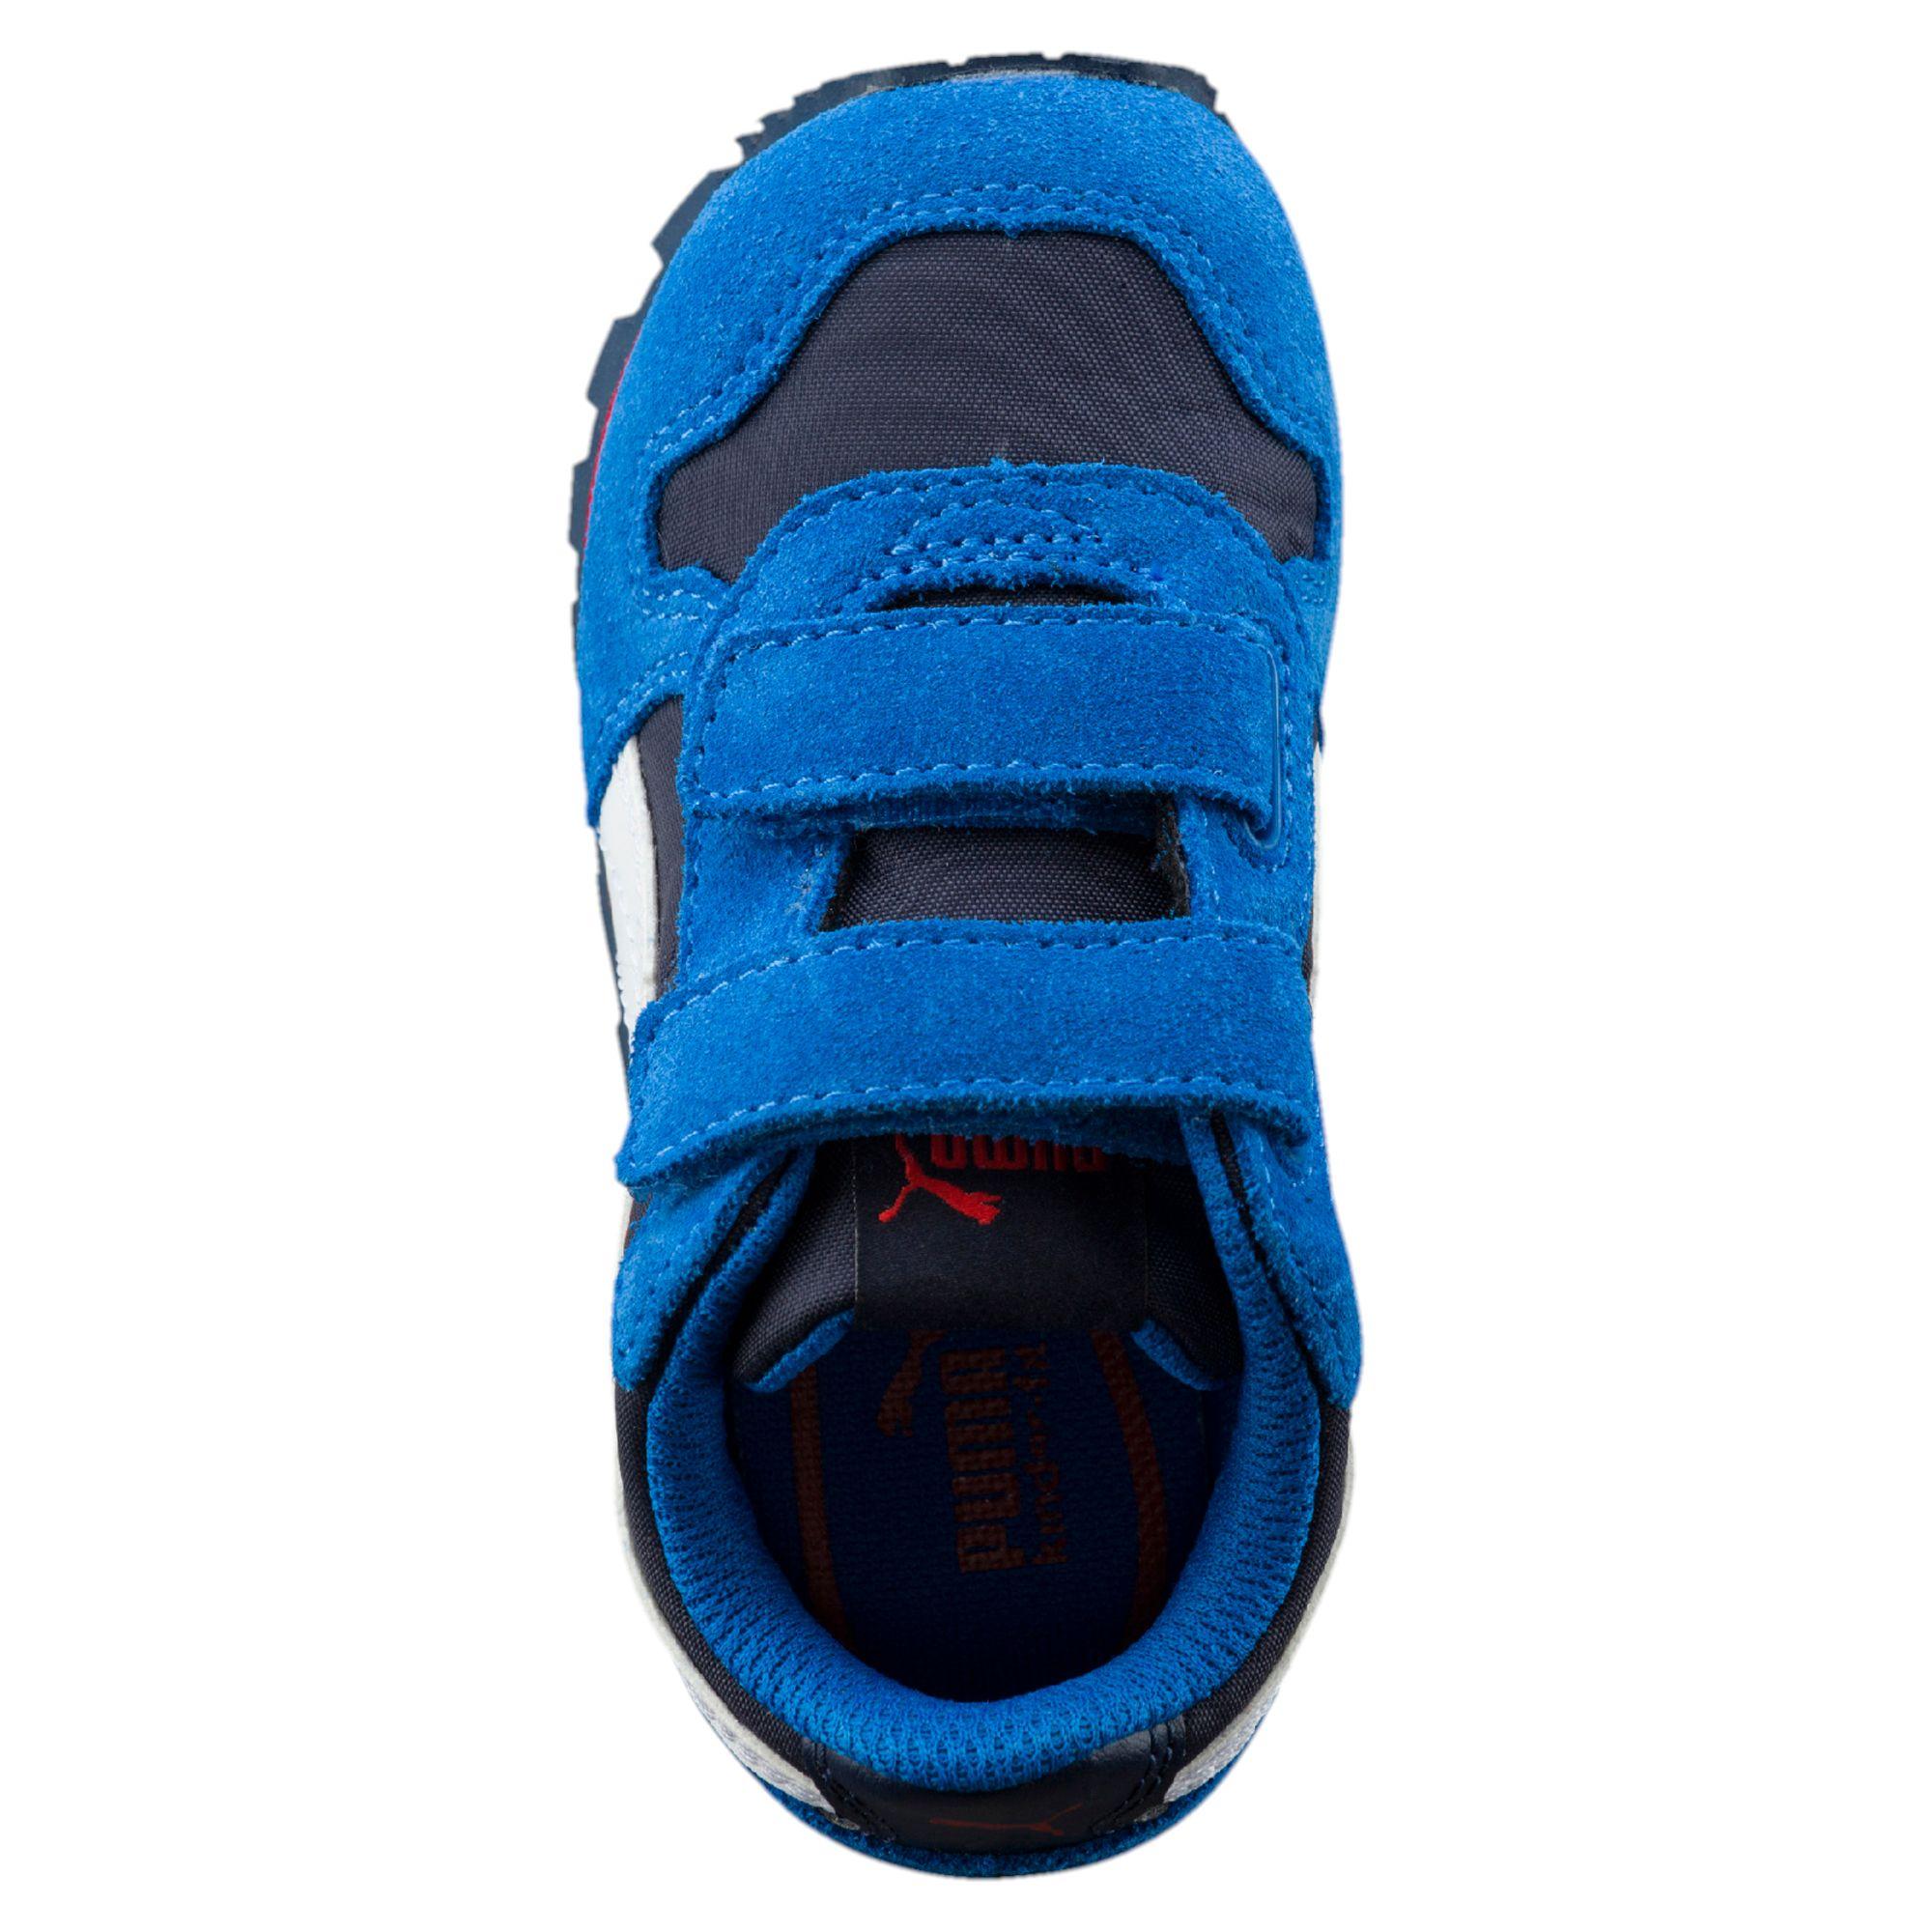 PUMA ST Runner Kinder Sneaker Schuhe Kinder Unisex Neu